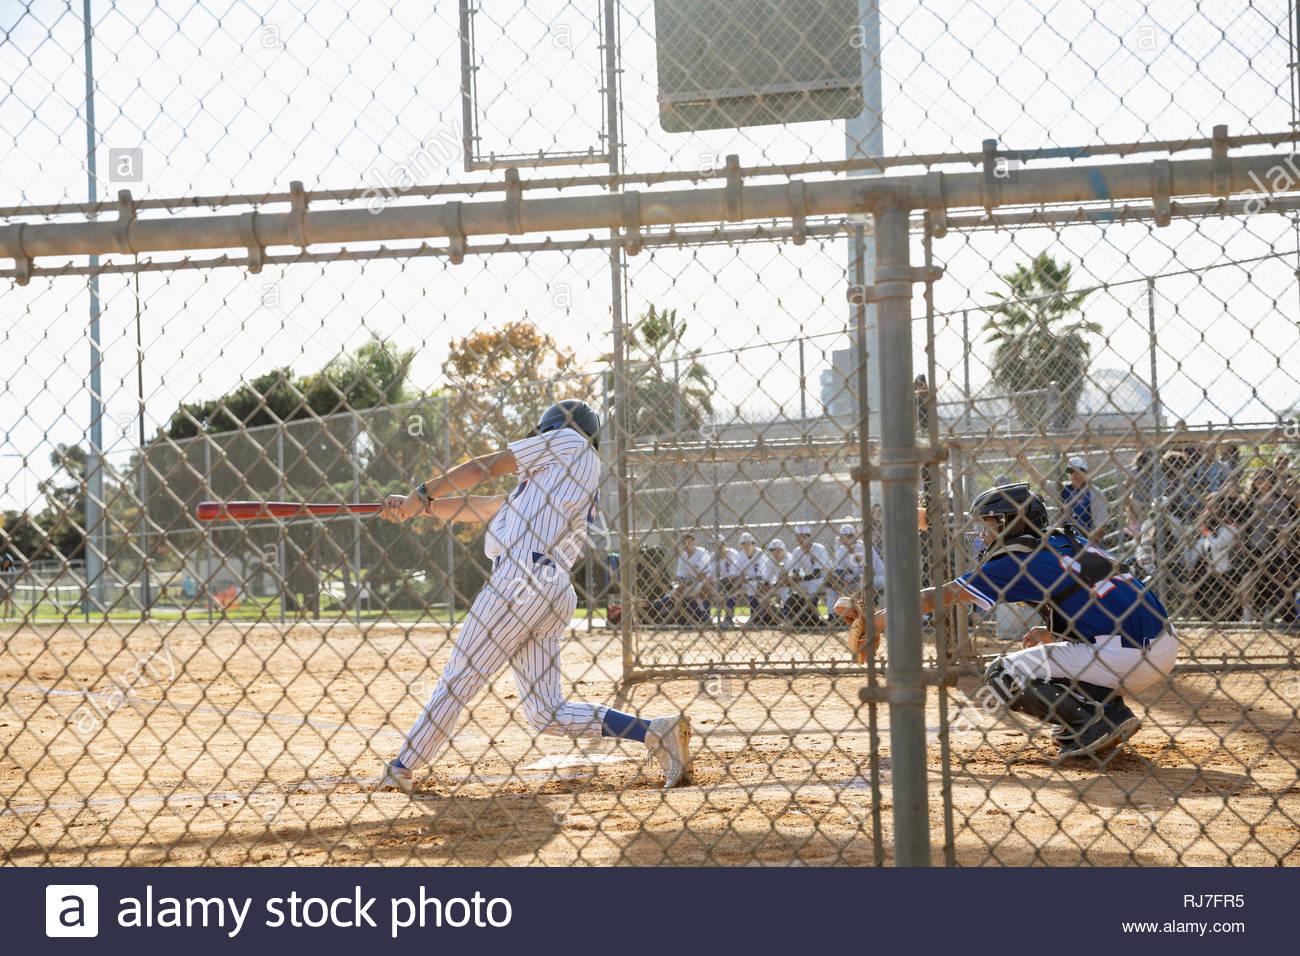 Baseball player at bat on sunny field Stock Photo